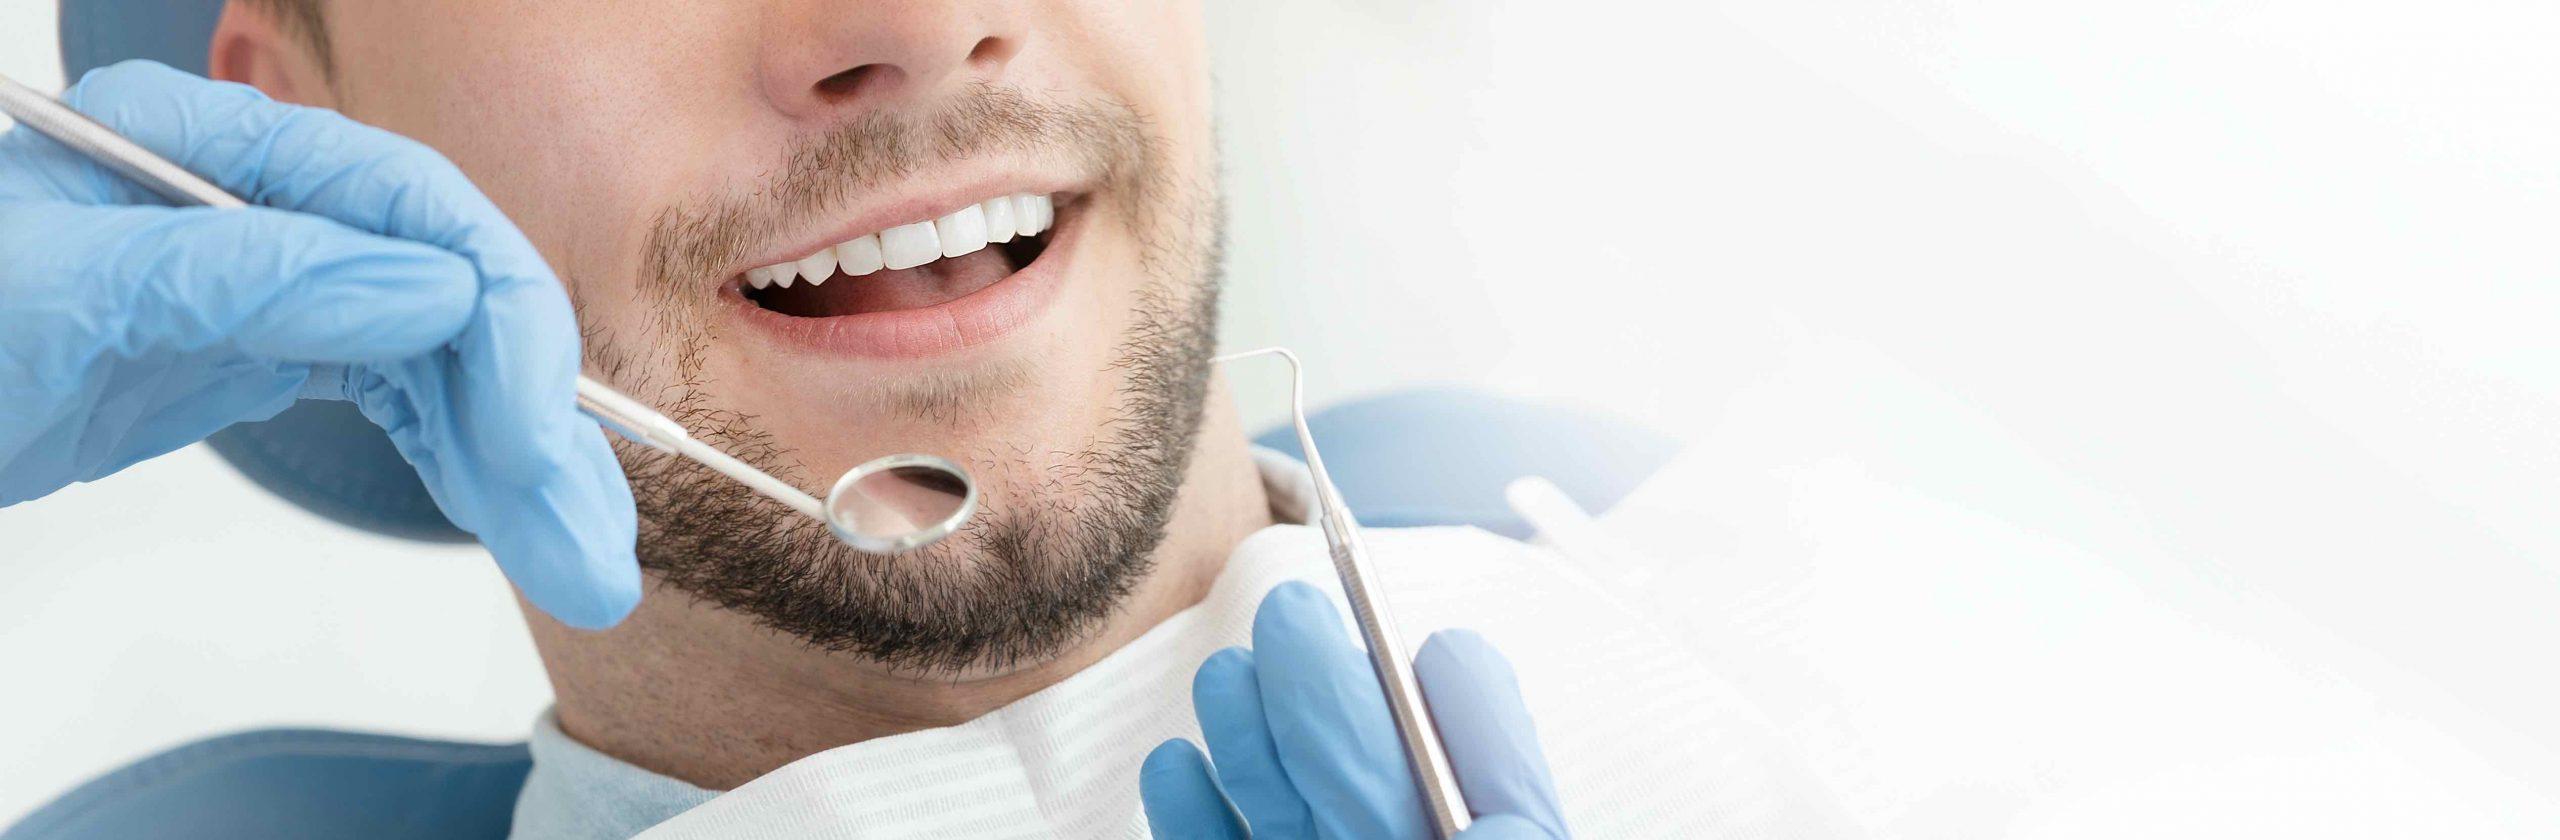 dentist thousand oaks